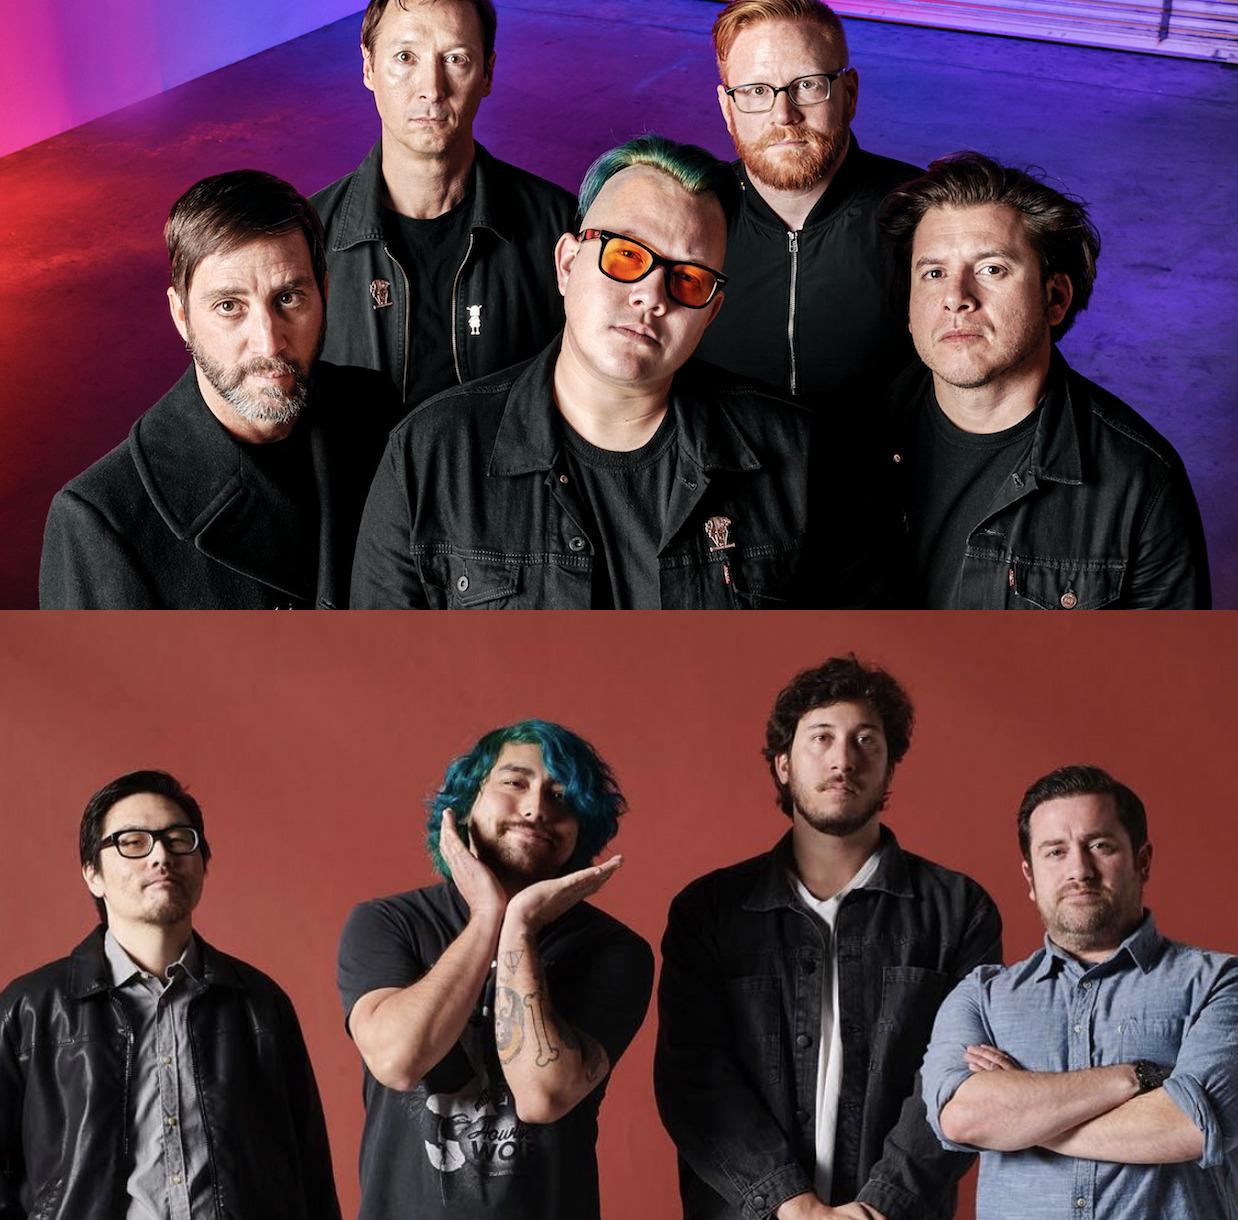 PREMIERE: Fellow Robot + Bundy team up for four-track split EP